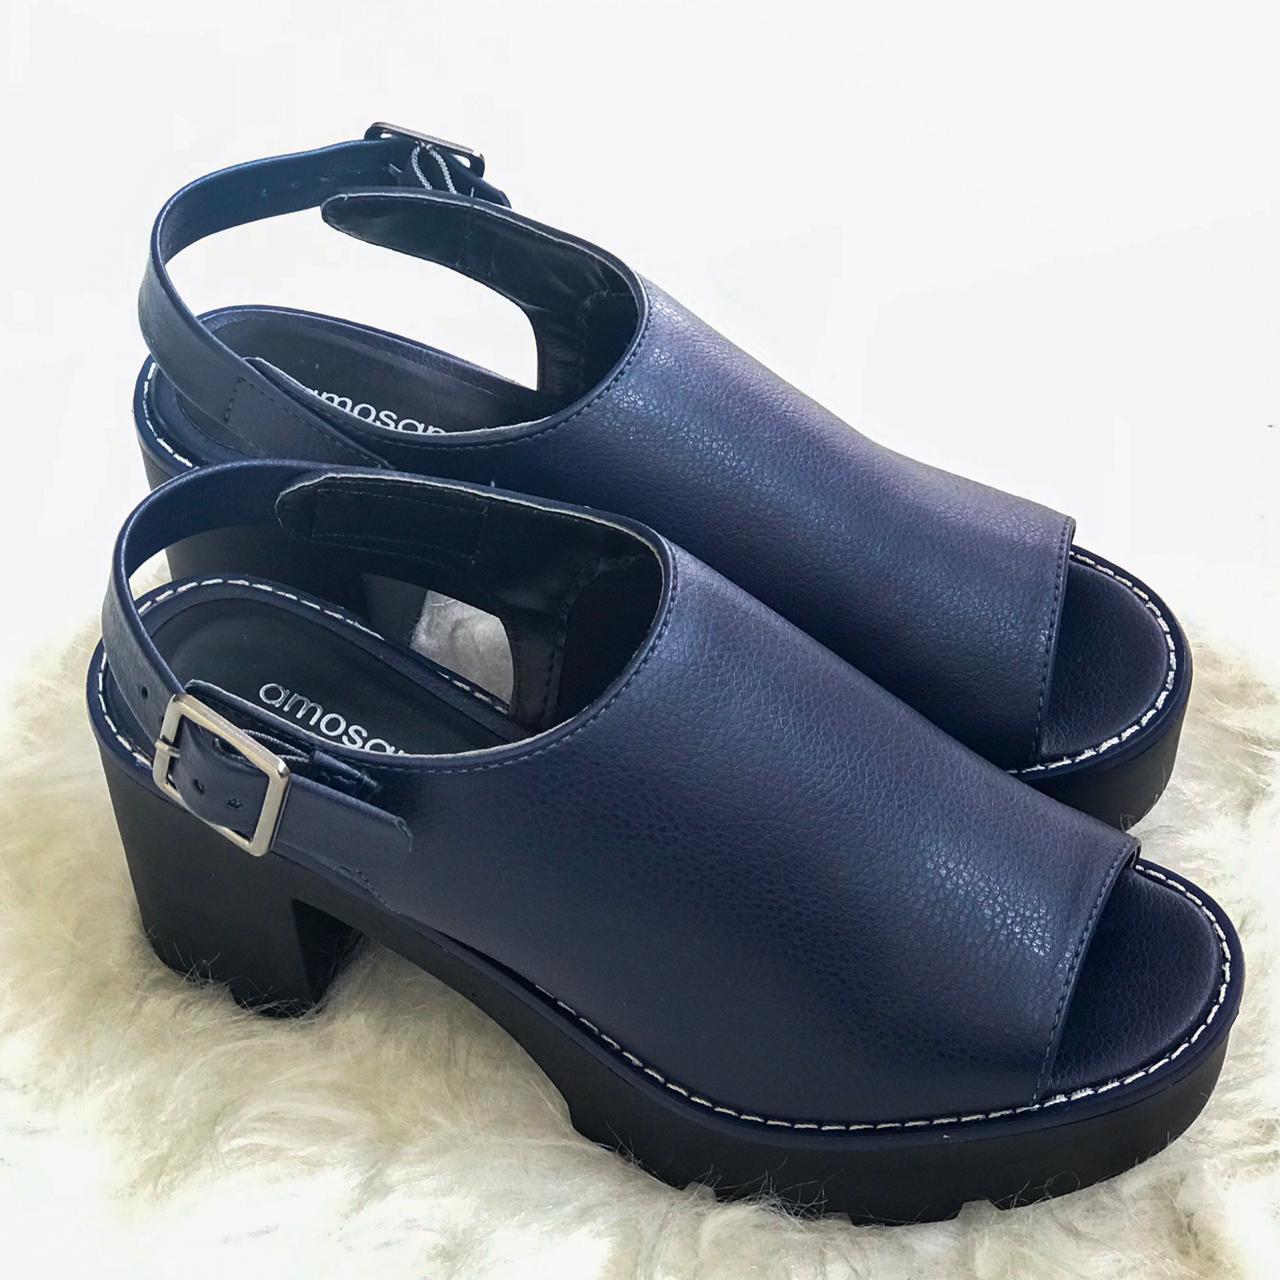 Sand Boots Tratorada Bia Azul Marinho